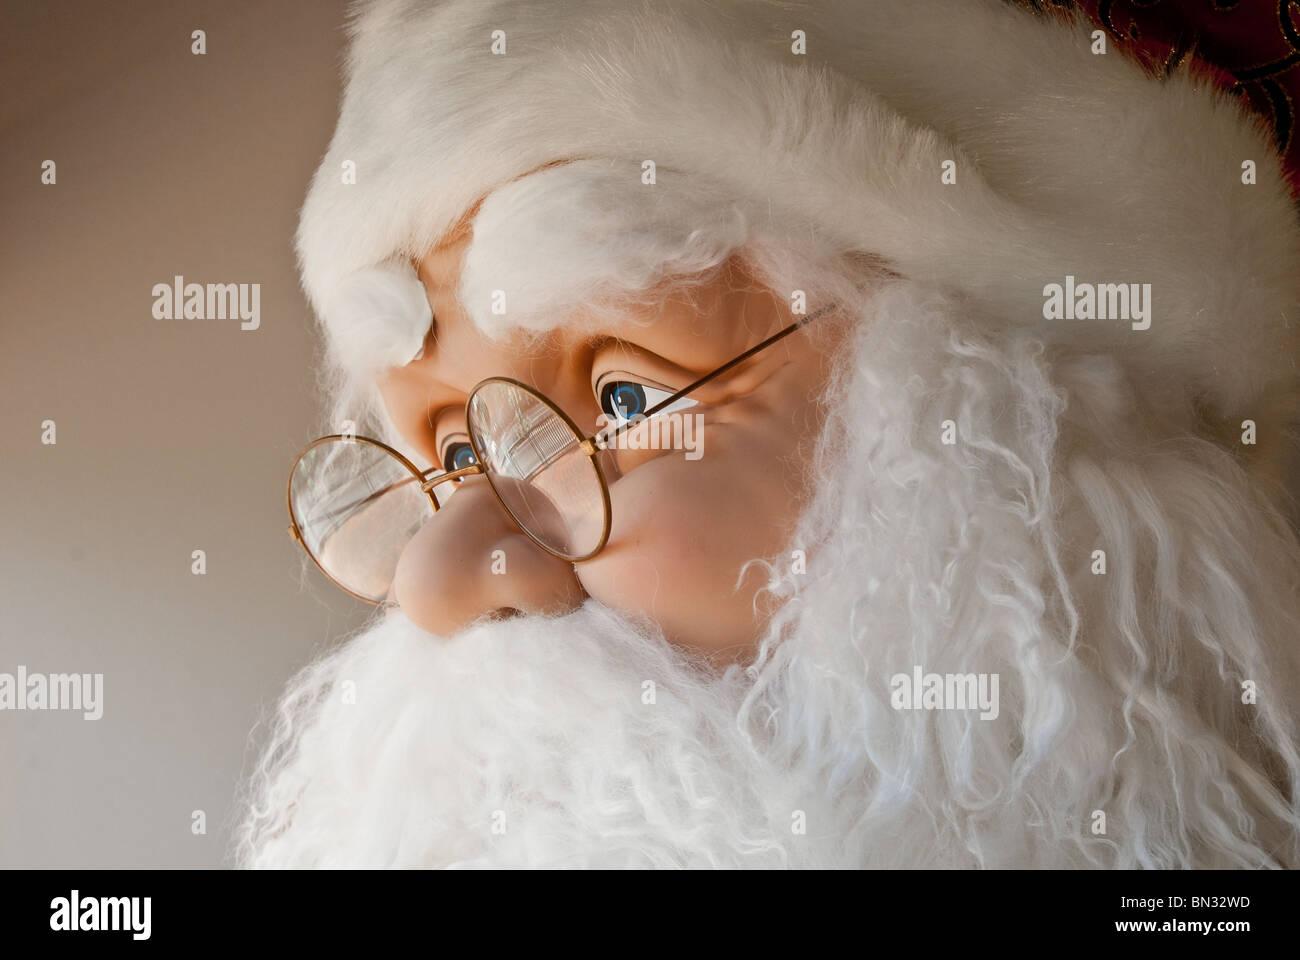 Life-size Santa Claus figure in store display, Orlando, Florida, USA Stock Photo